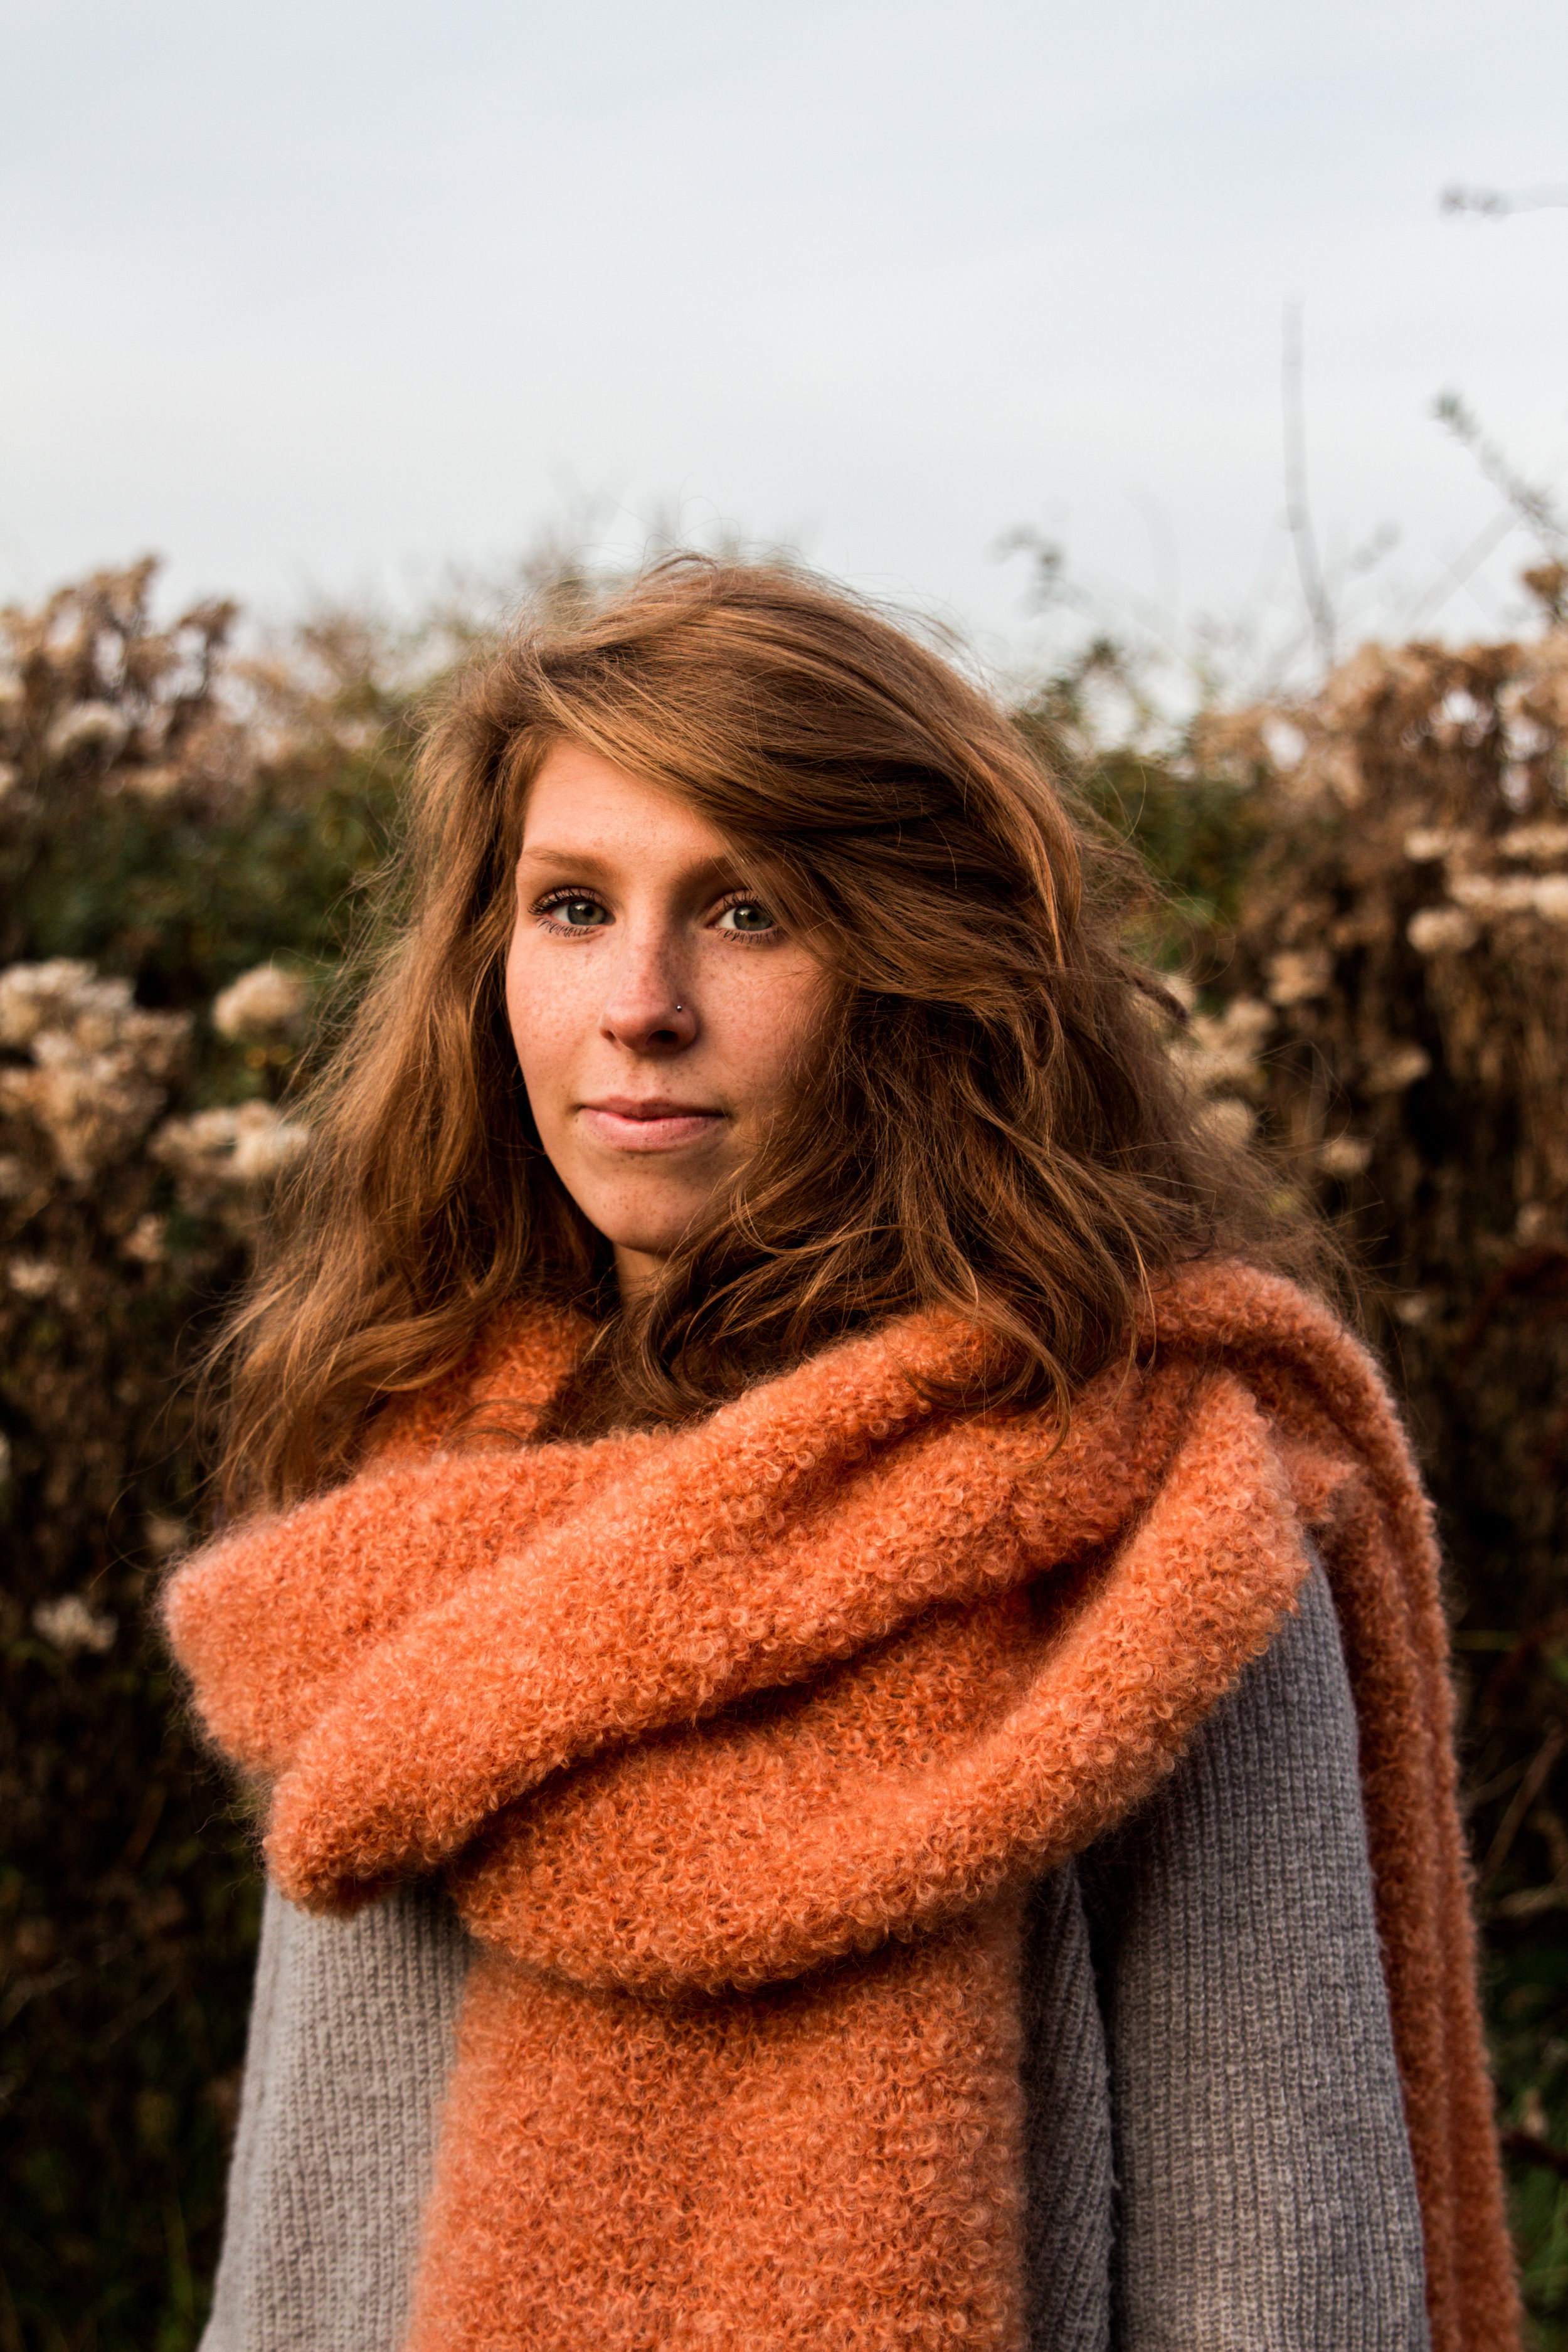 Ylle keeps you warm - www.haarscherp.be